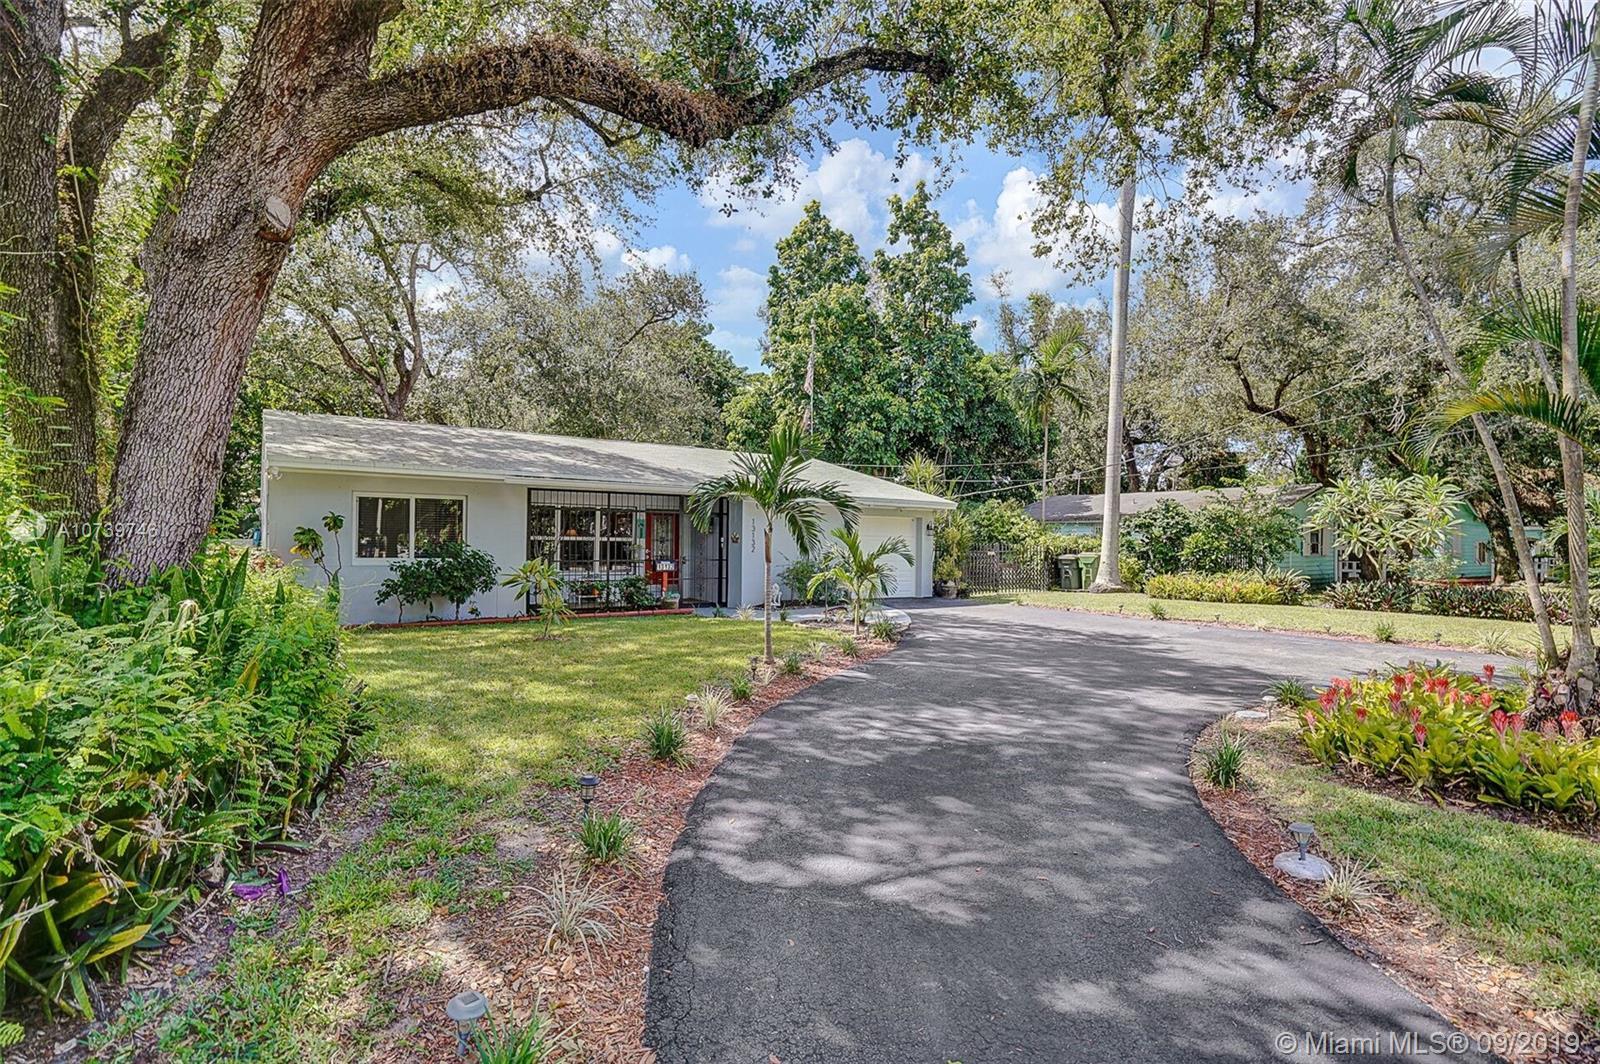 13132 NE 4th Ave, Miami Shores, Florida